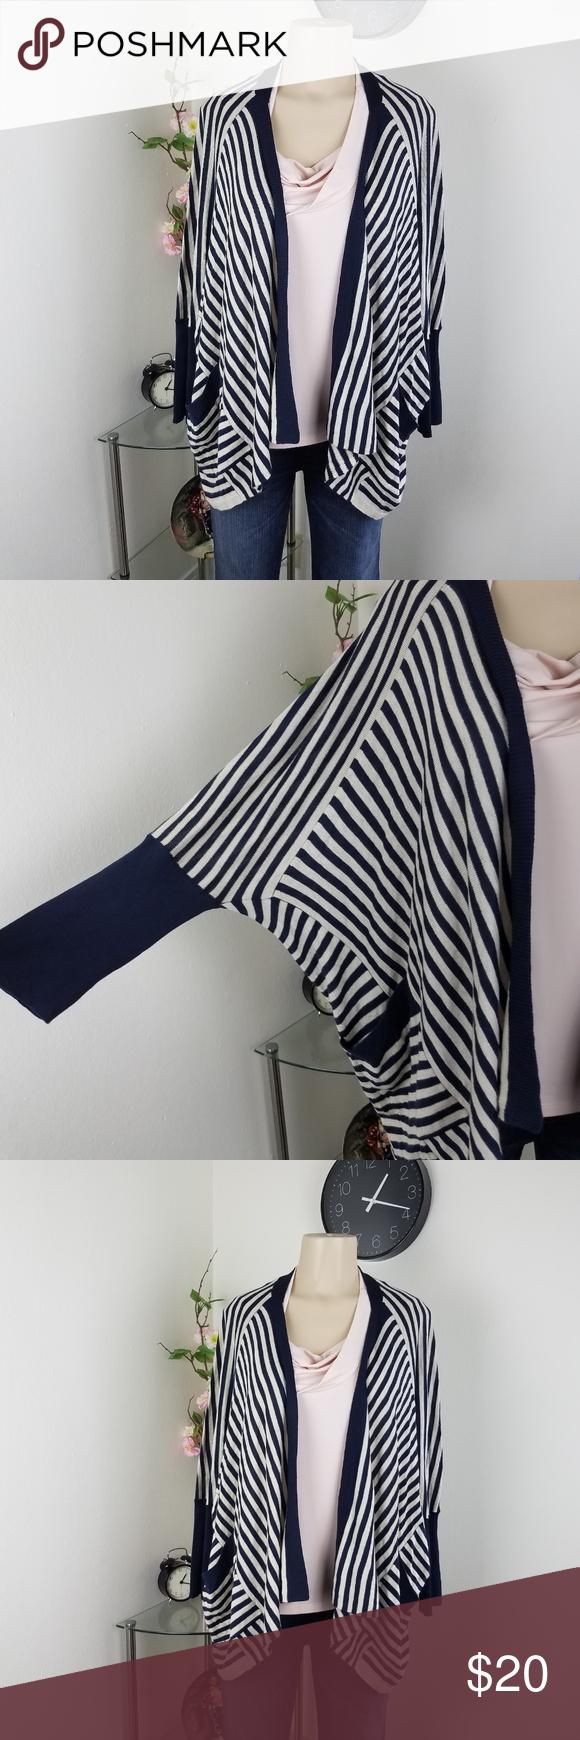 89th Madison Sweater Cardigan My Posh Closet Pinterest